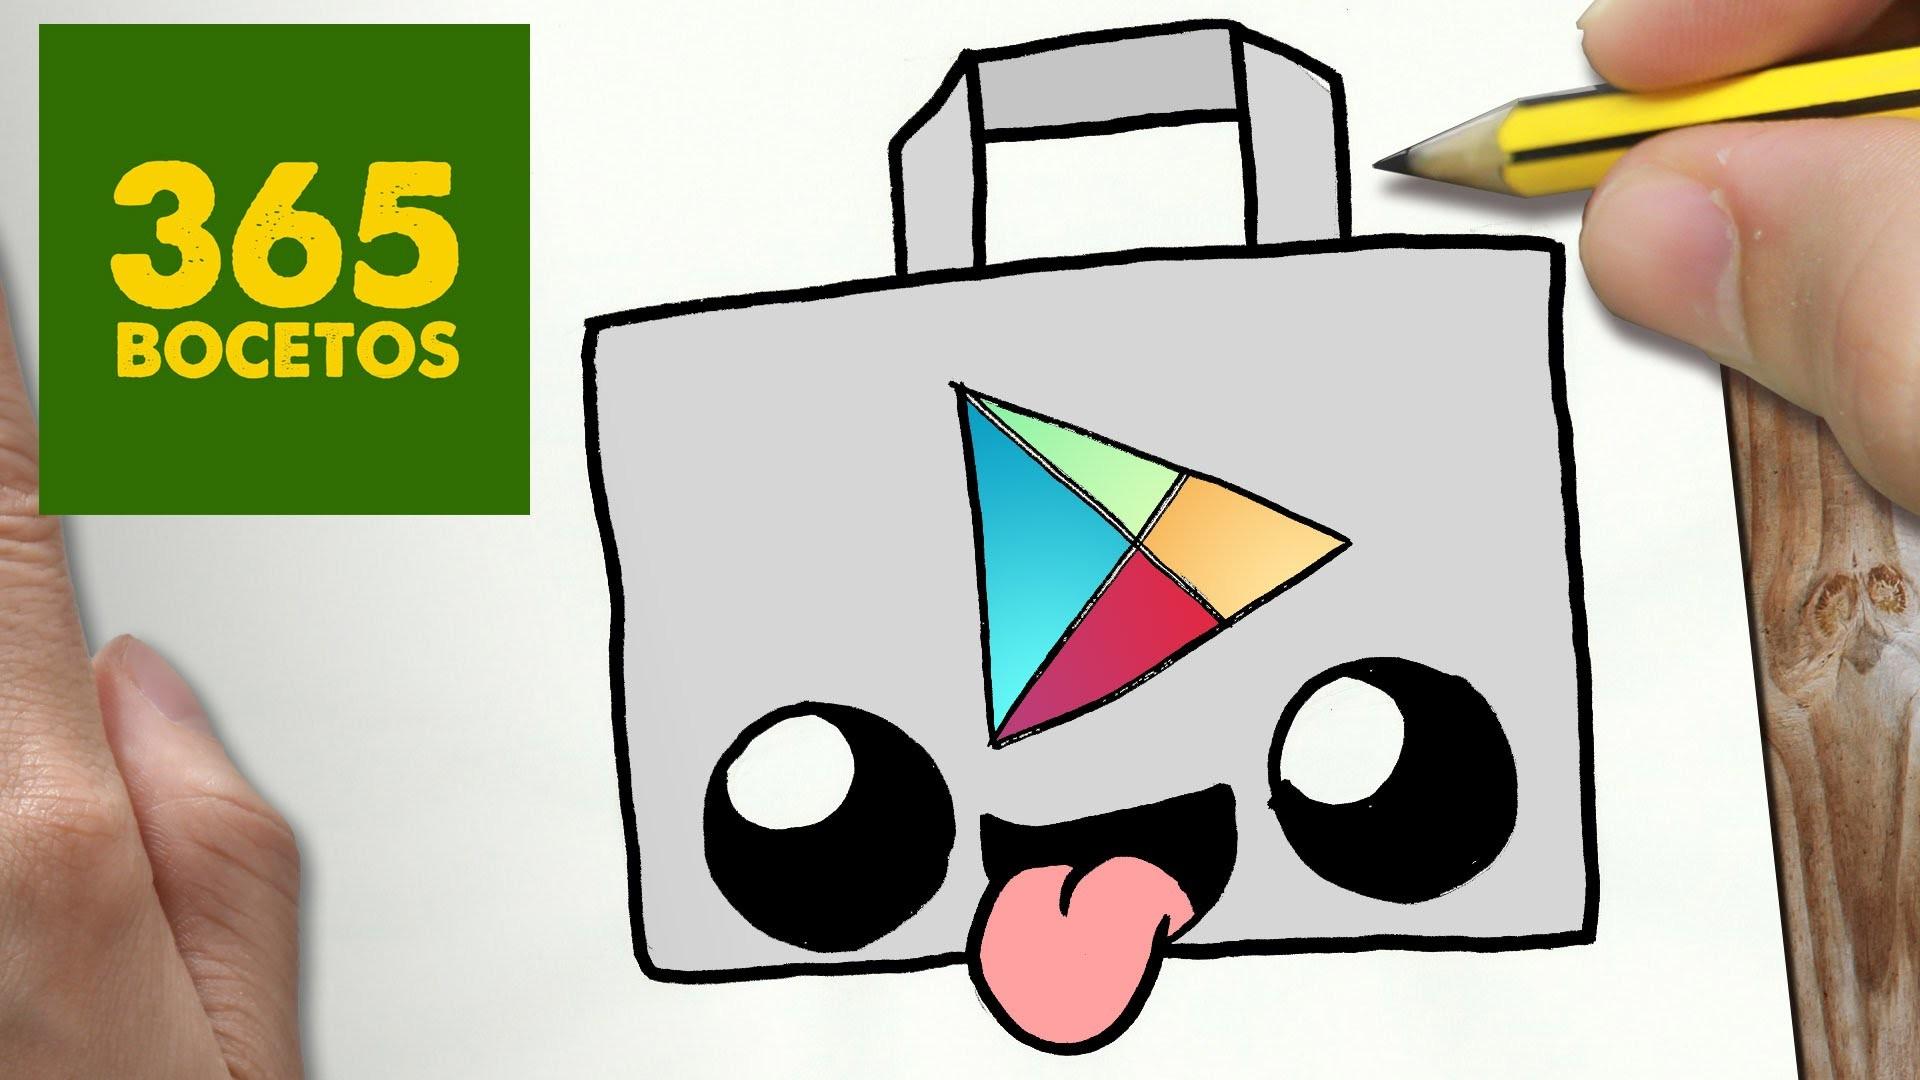 COMO DIBUJAR LOGO PLAY STORE KAWAII PASO A PASO - Dibujos kawaii faciles - draw logo play store